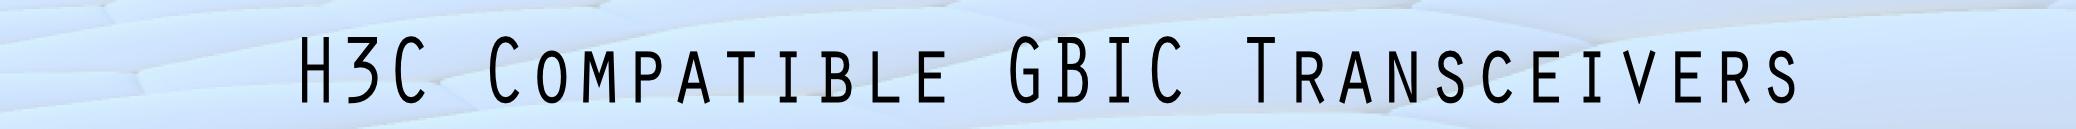 H3C Gigabit Ethernet Fiber Optical GBIC Transceiver Modules